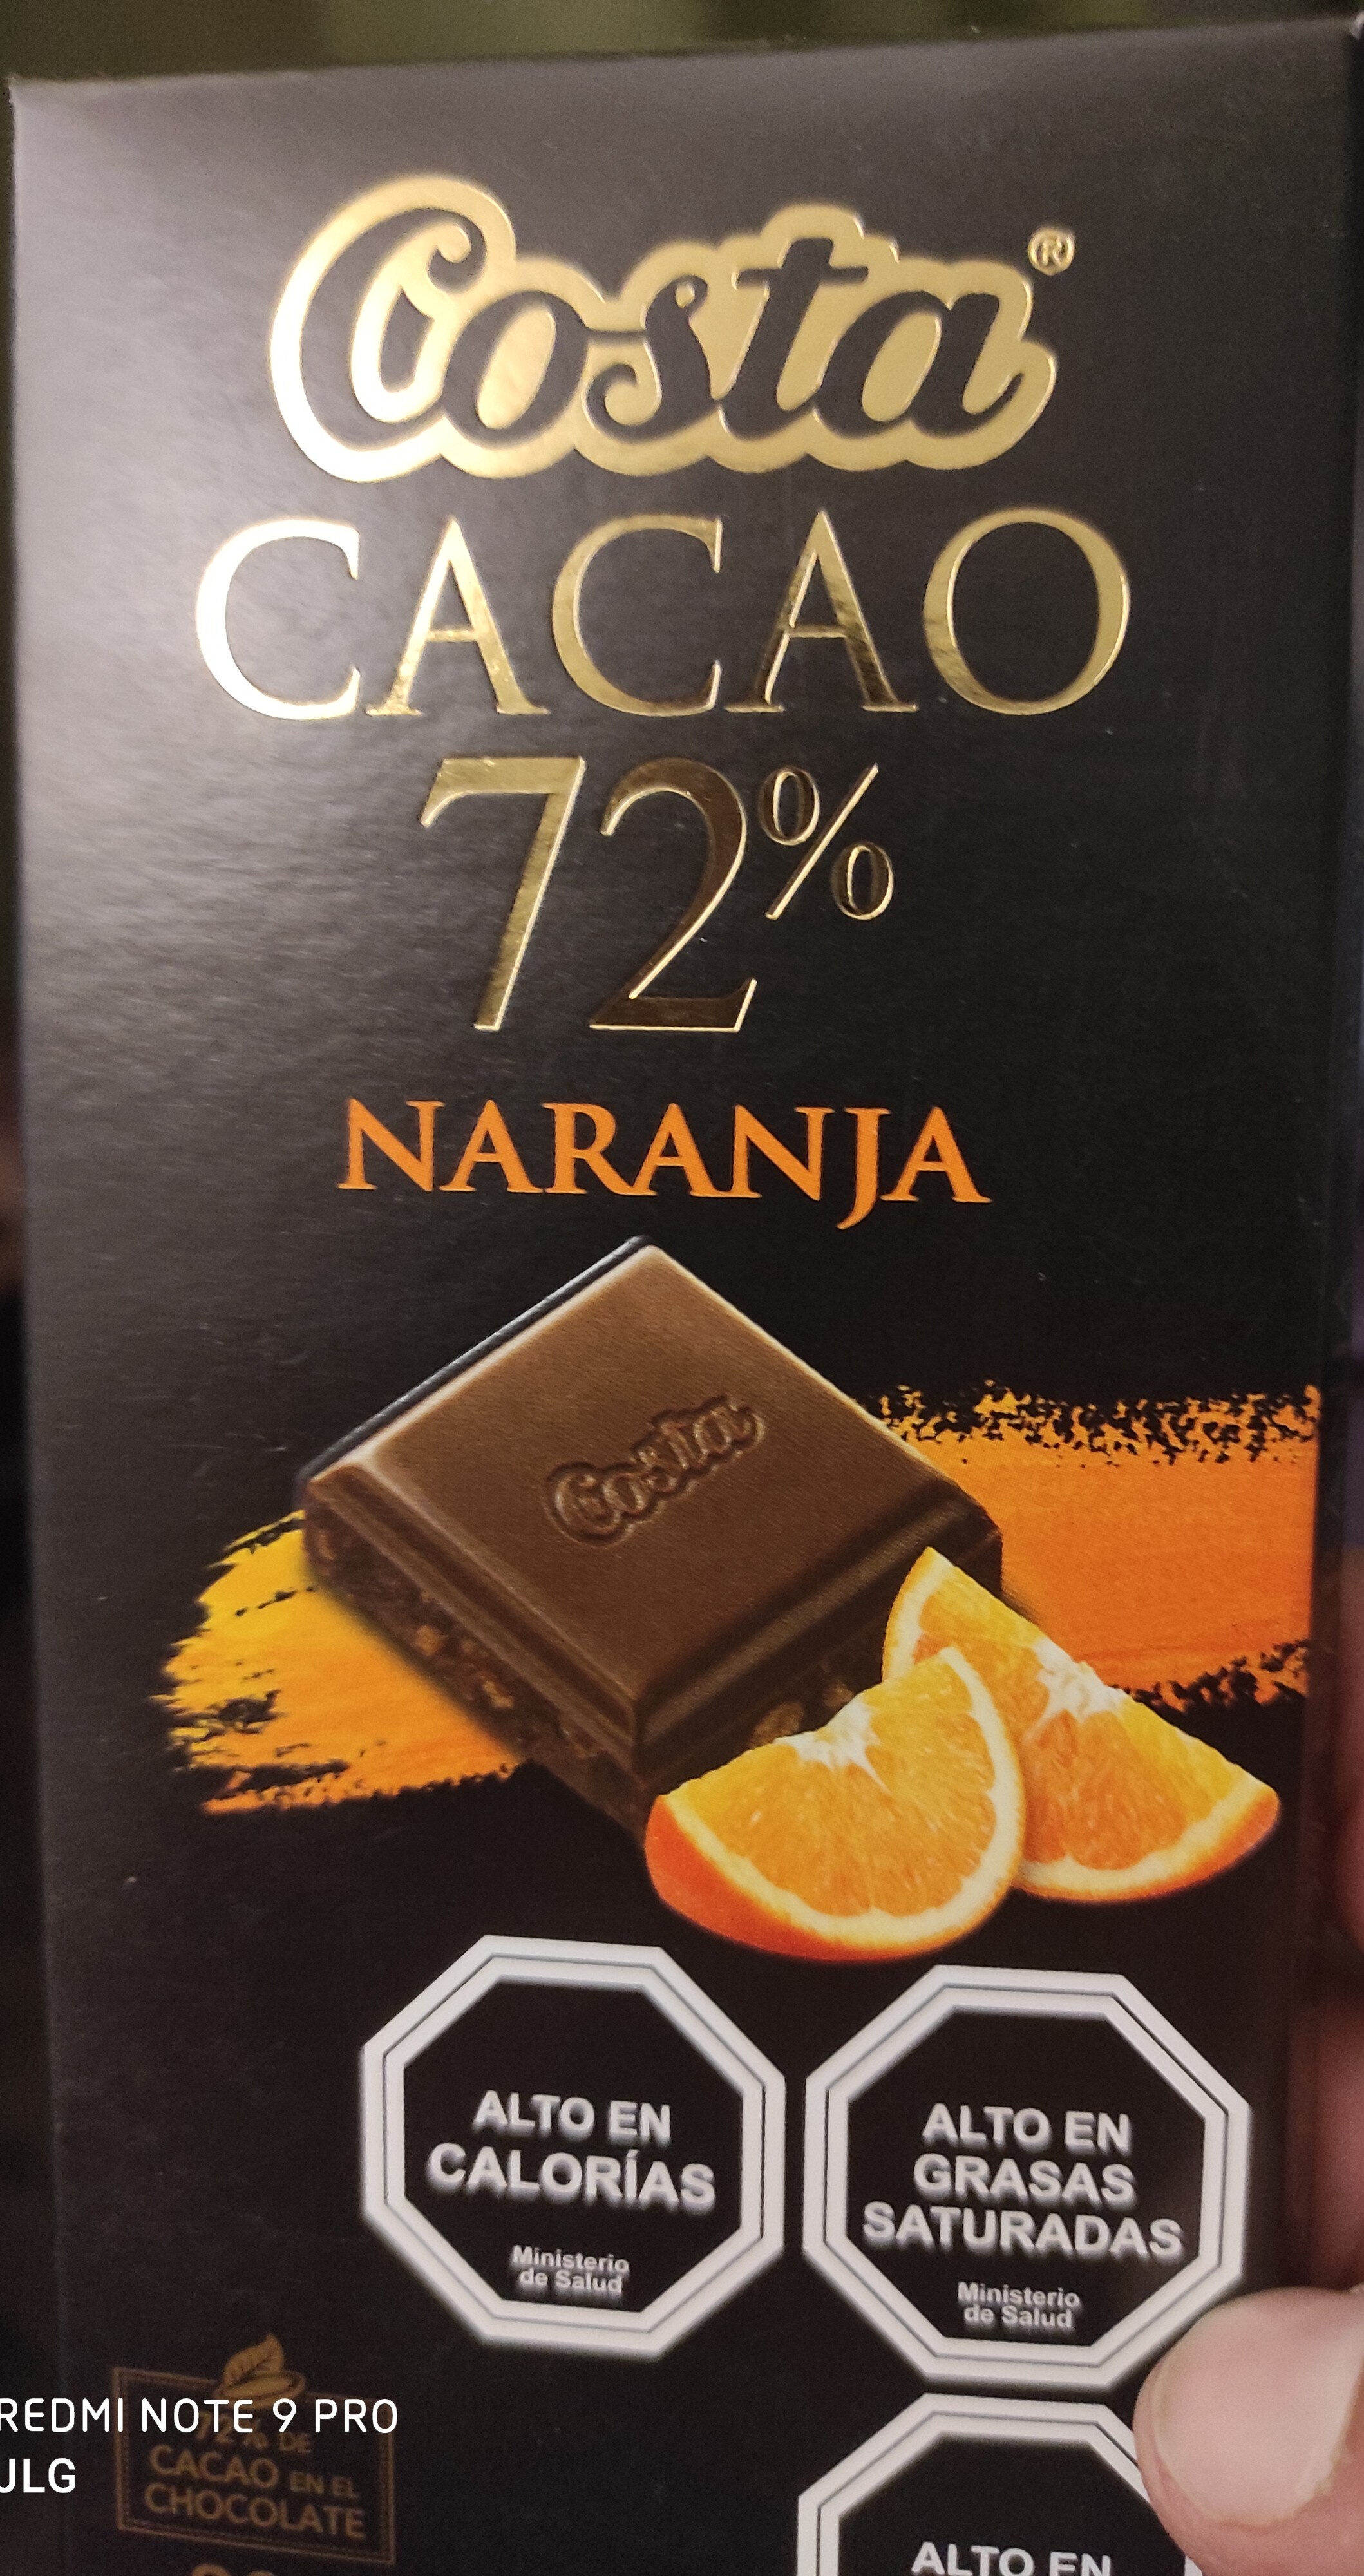 cacao 72% naranja - Product - es